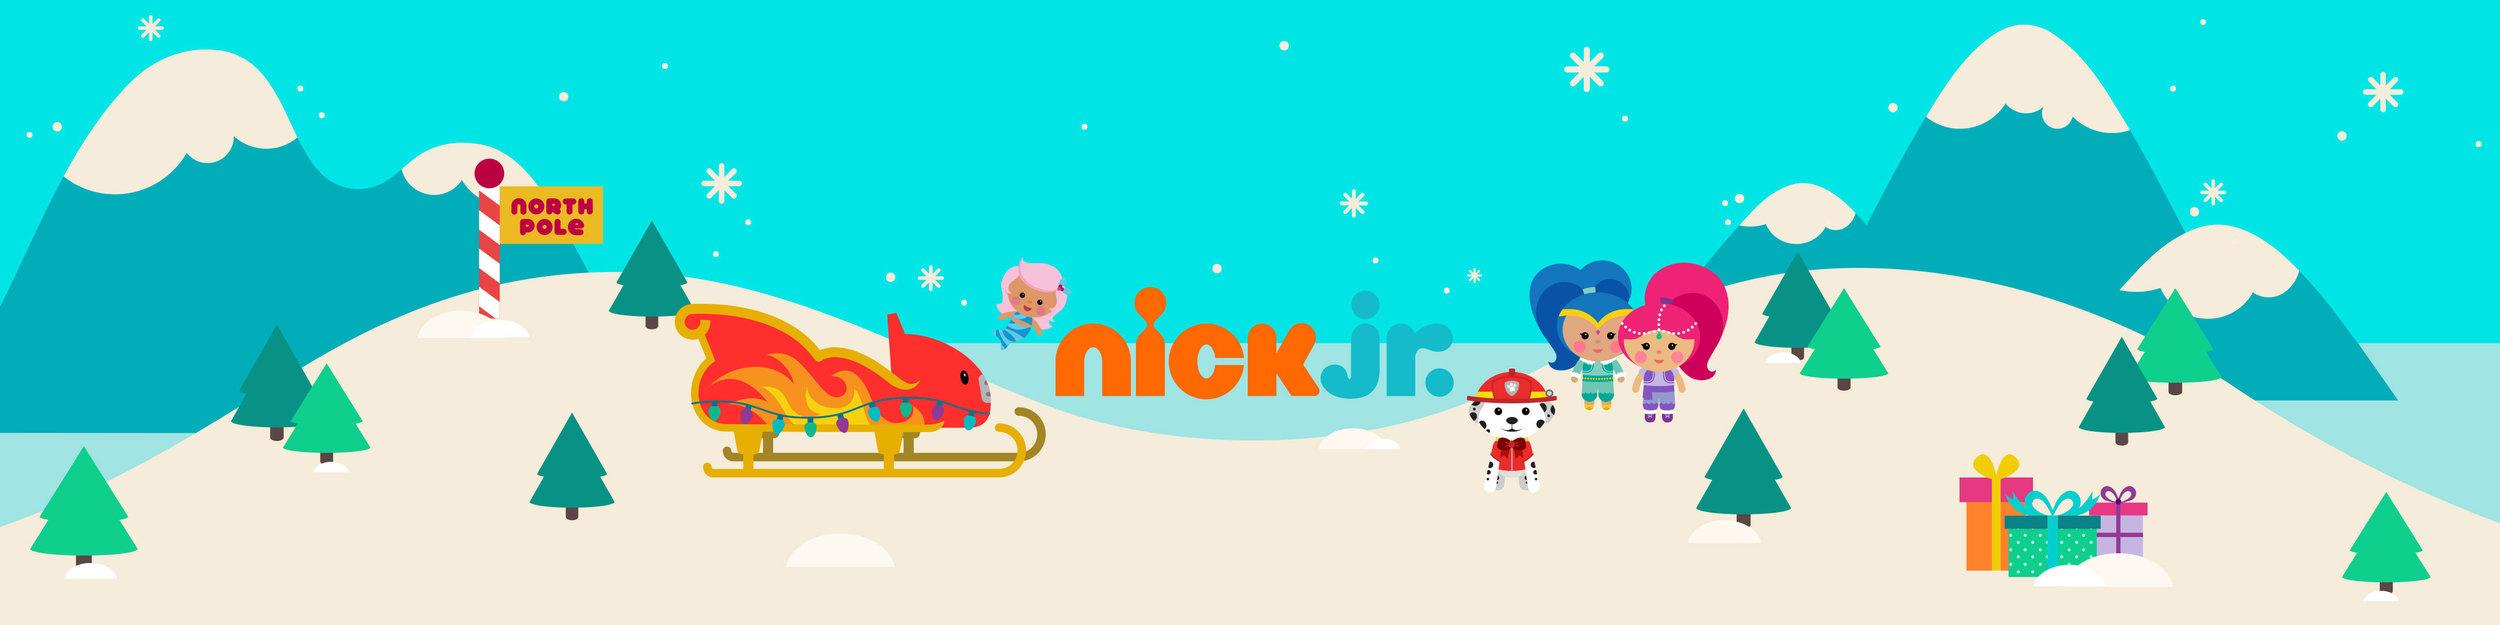 Nick Jr.  Apple Promotional Art